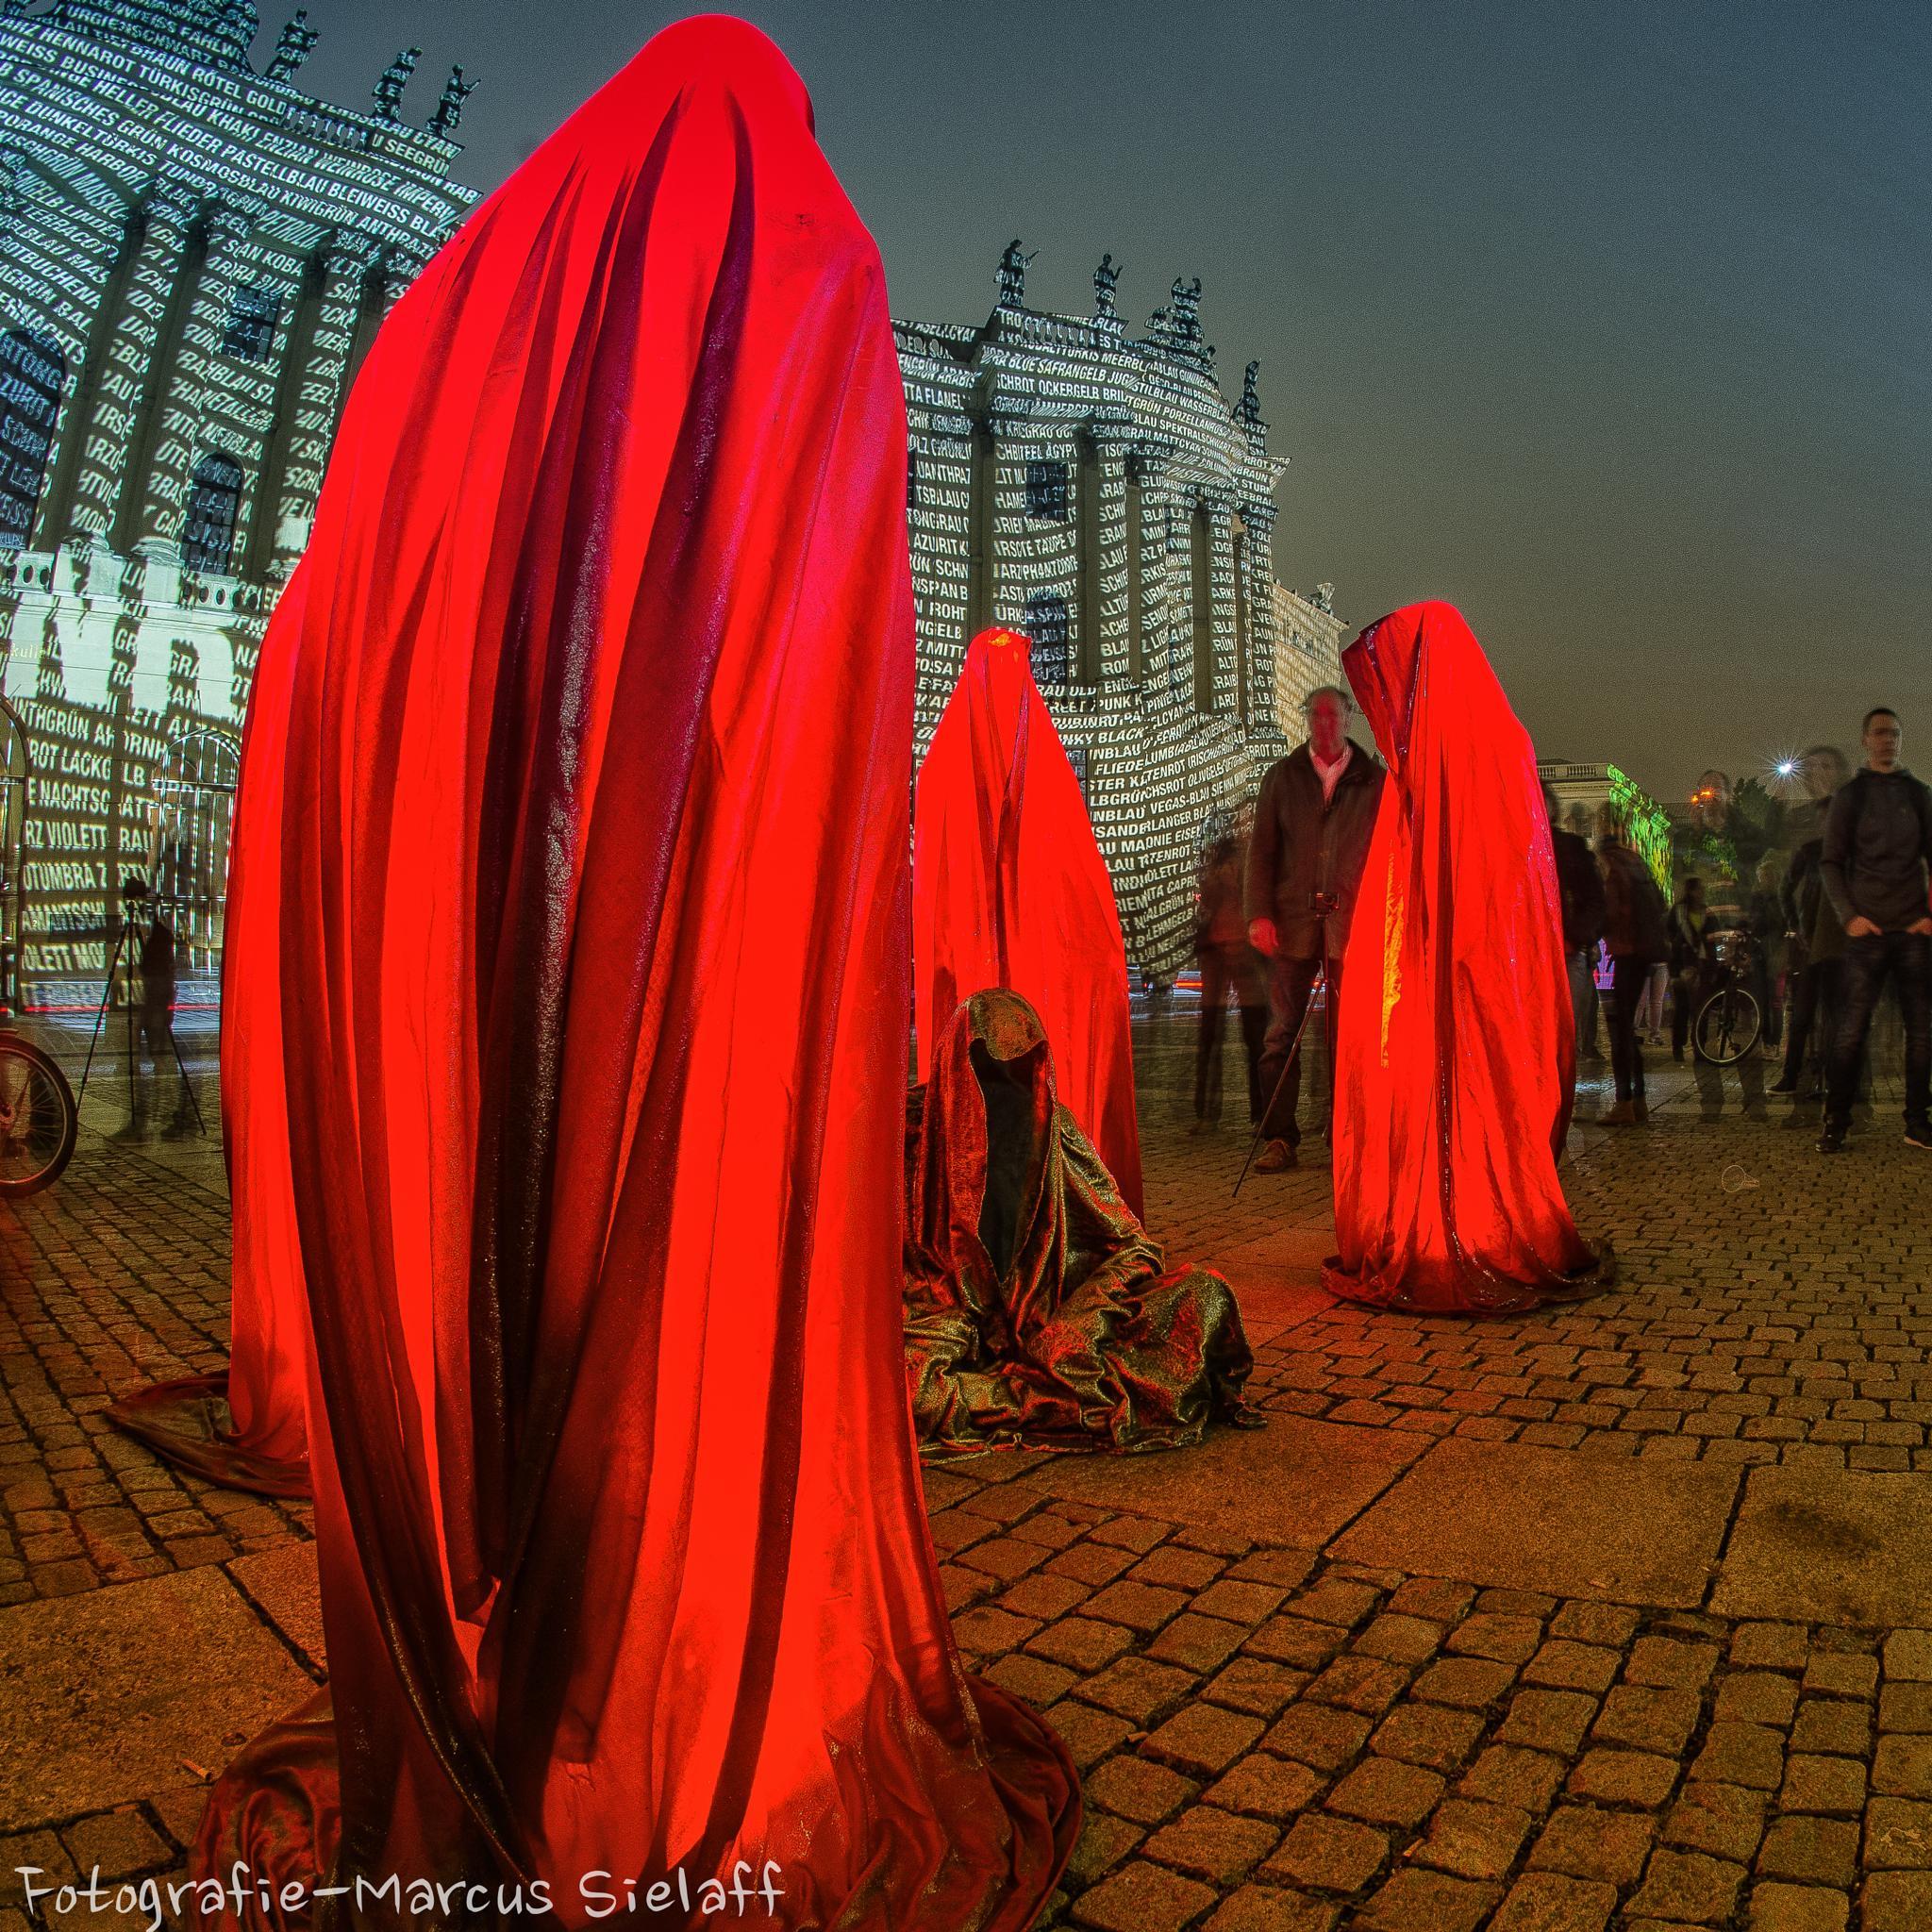 Festival of Lights Berlin by Marcus Sielaff